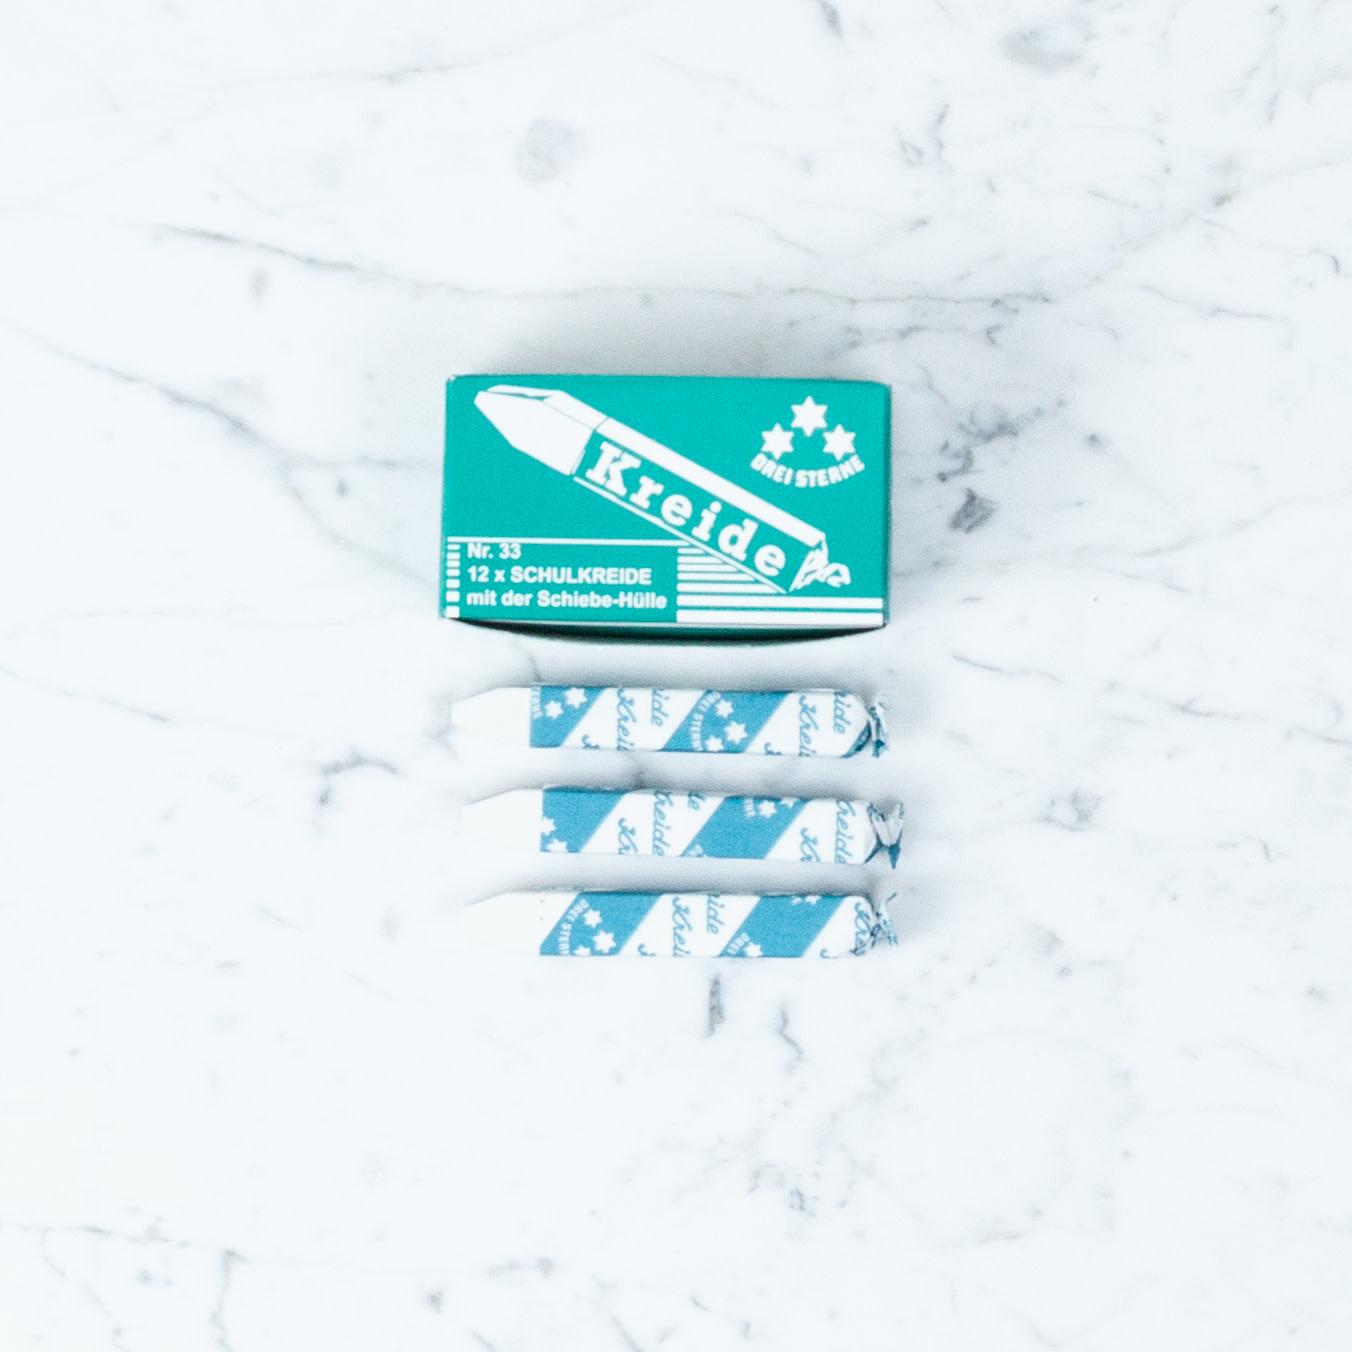 THREE STARS White School Chalk - Kreide - 12 Sticks In Box